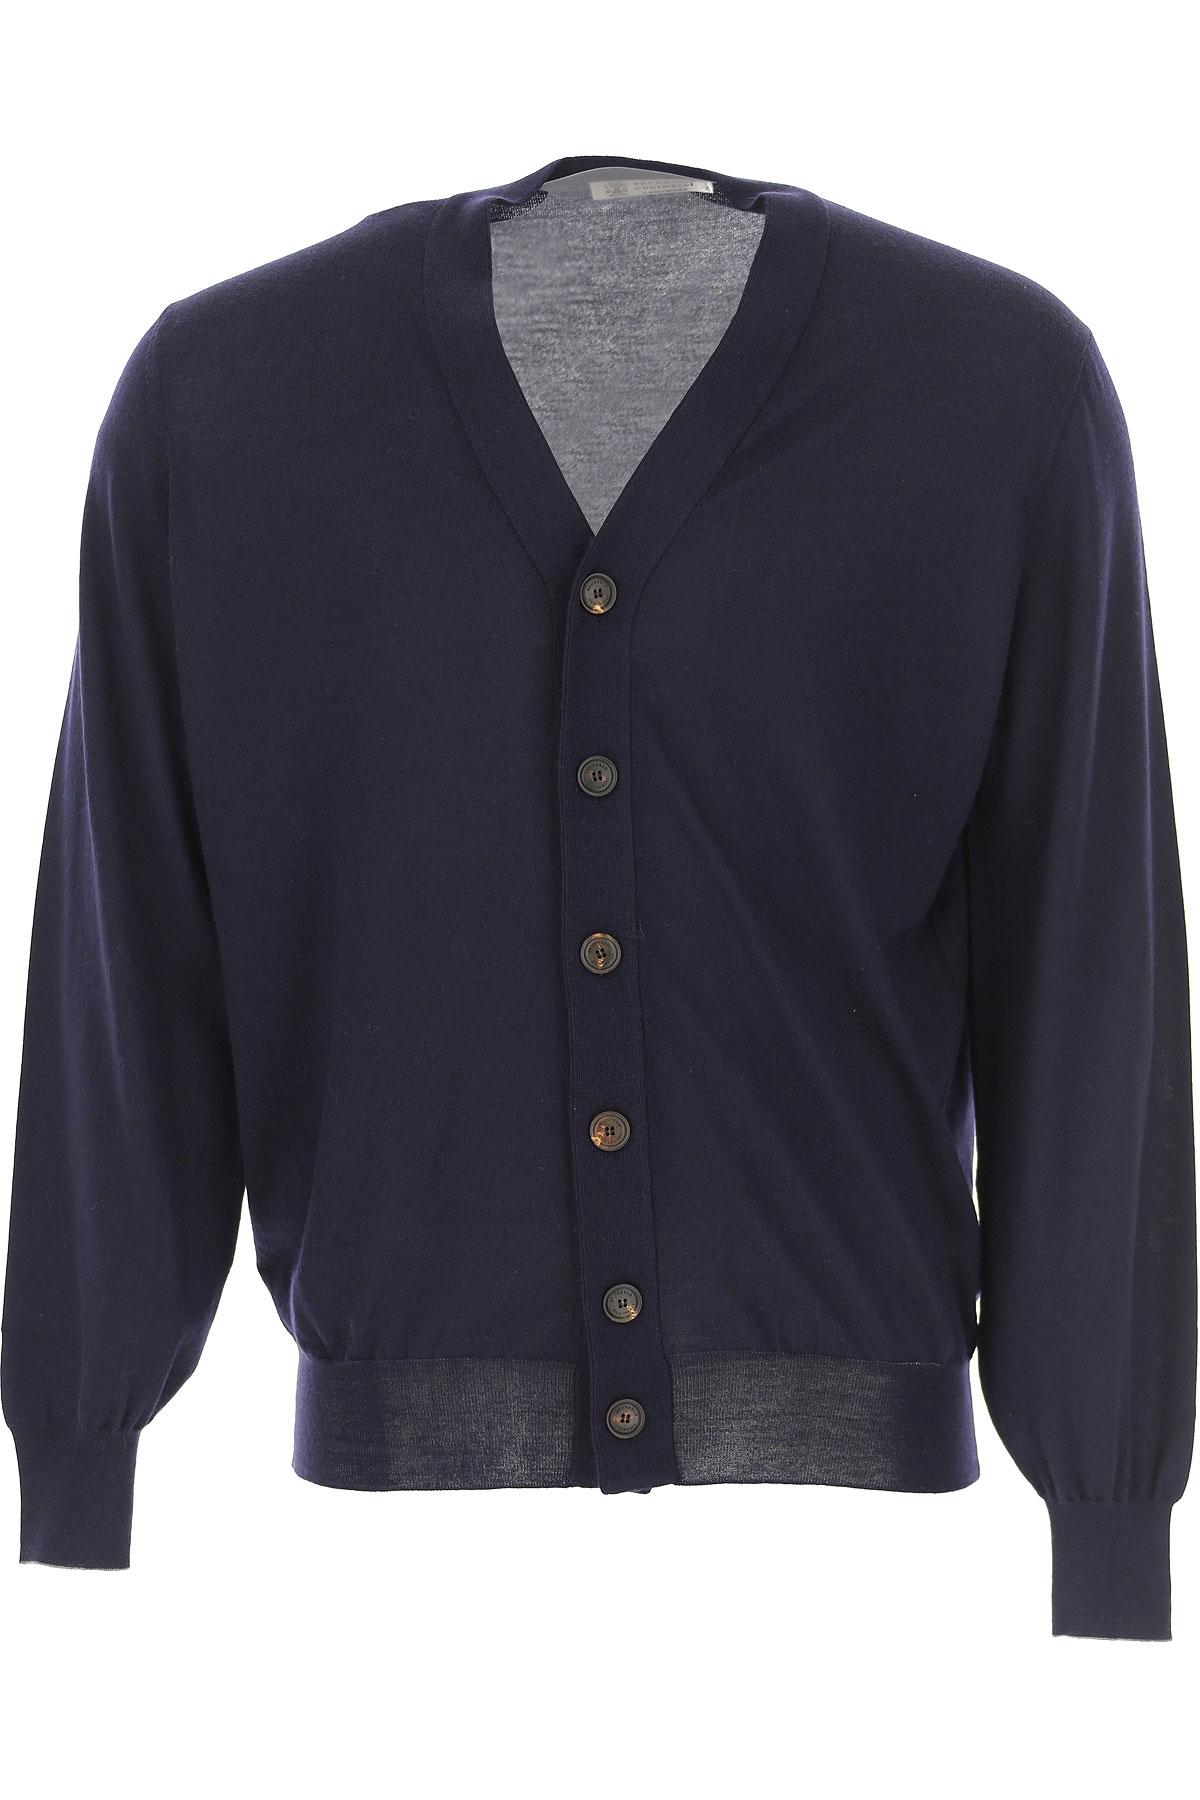 Brunello Cucinelli Sweater for Men Jumper On Sale, Blue Navy, Virgin wool, 2019, XL XXL